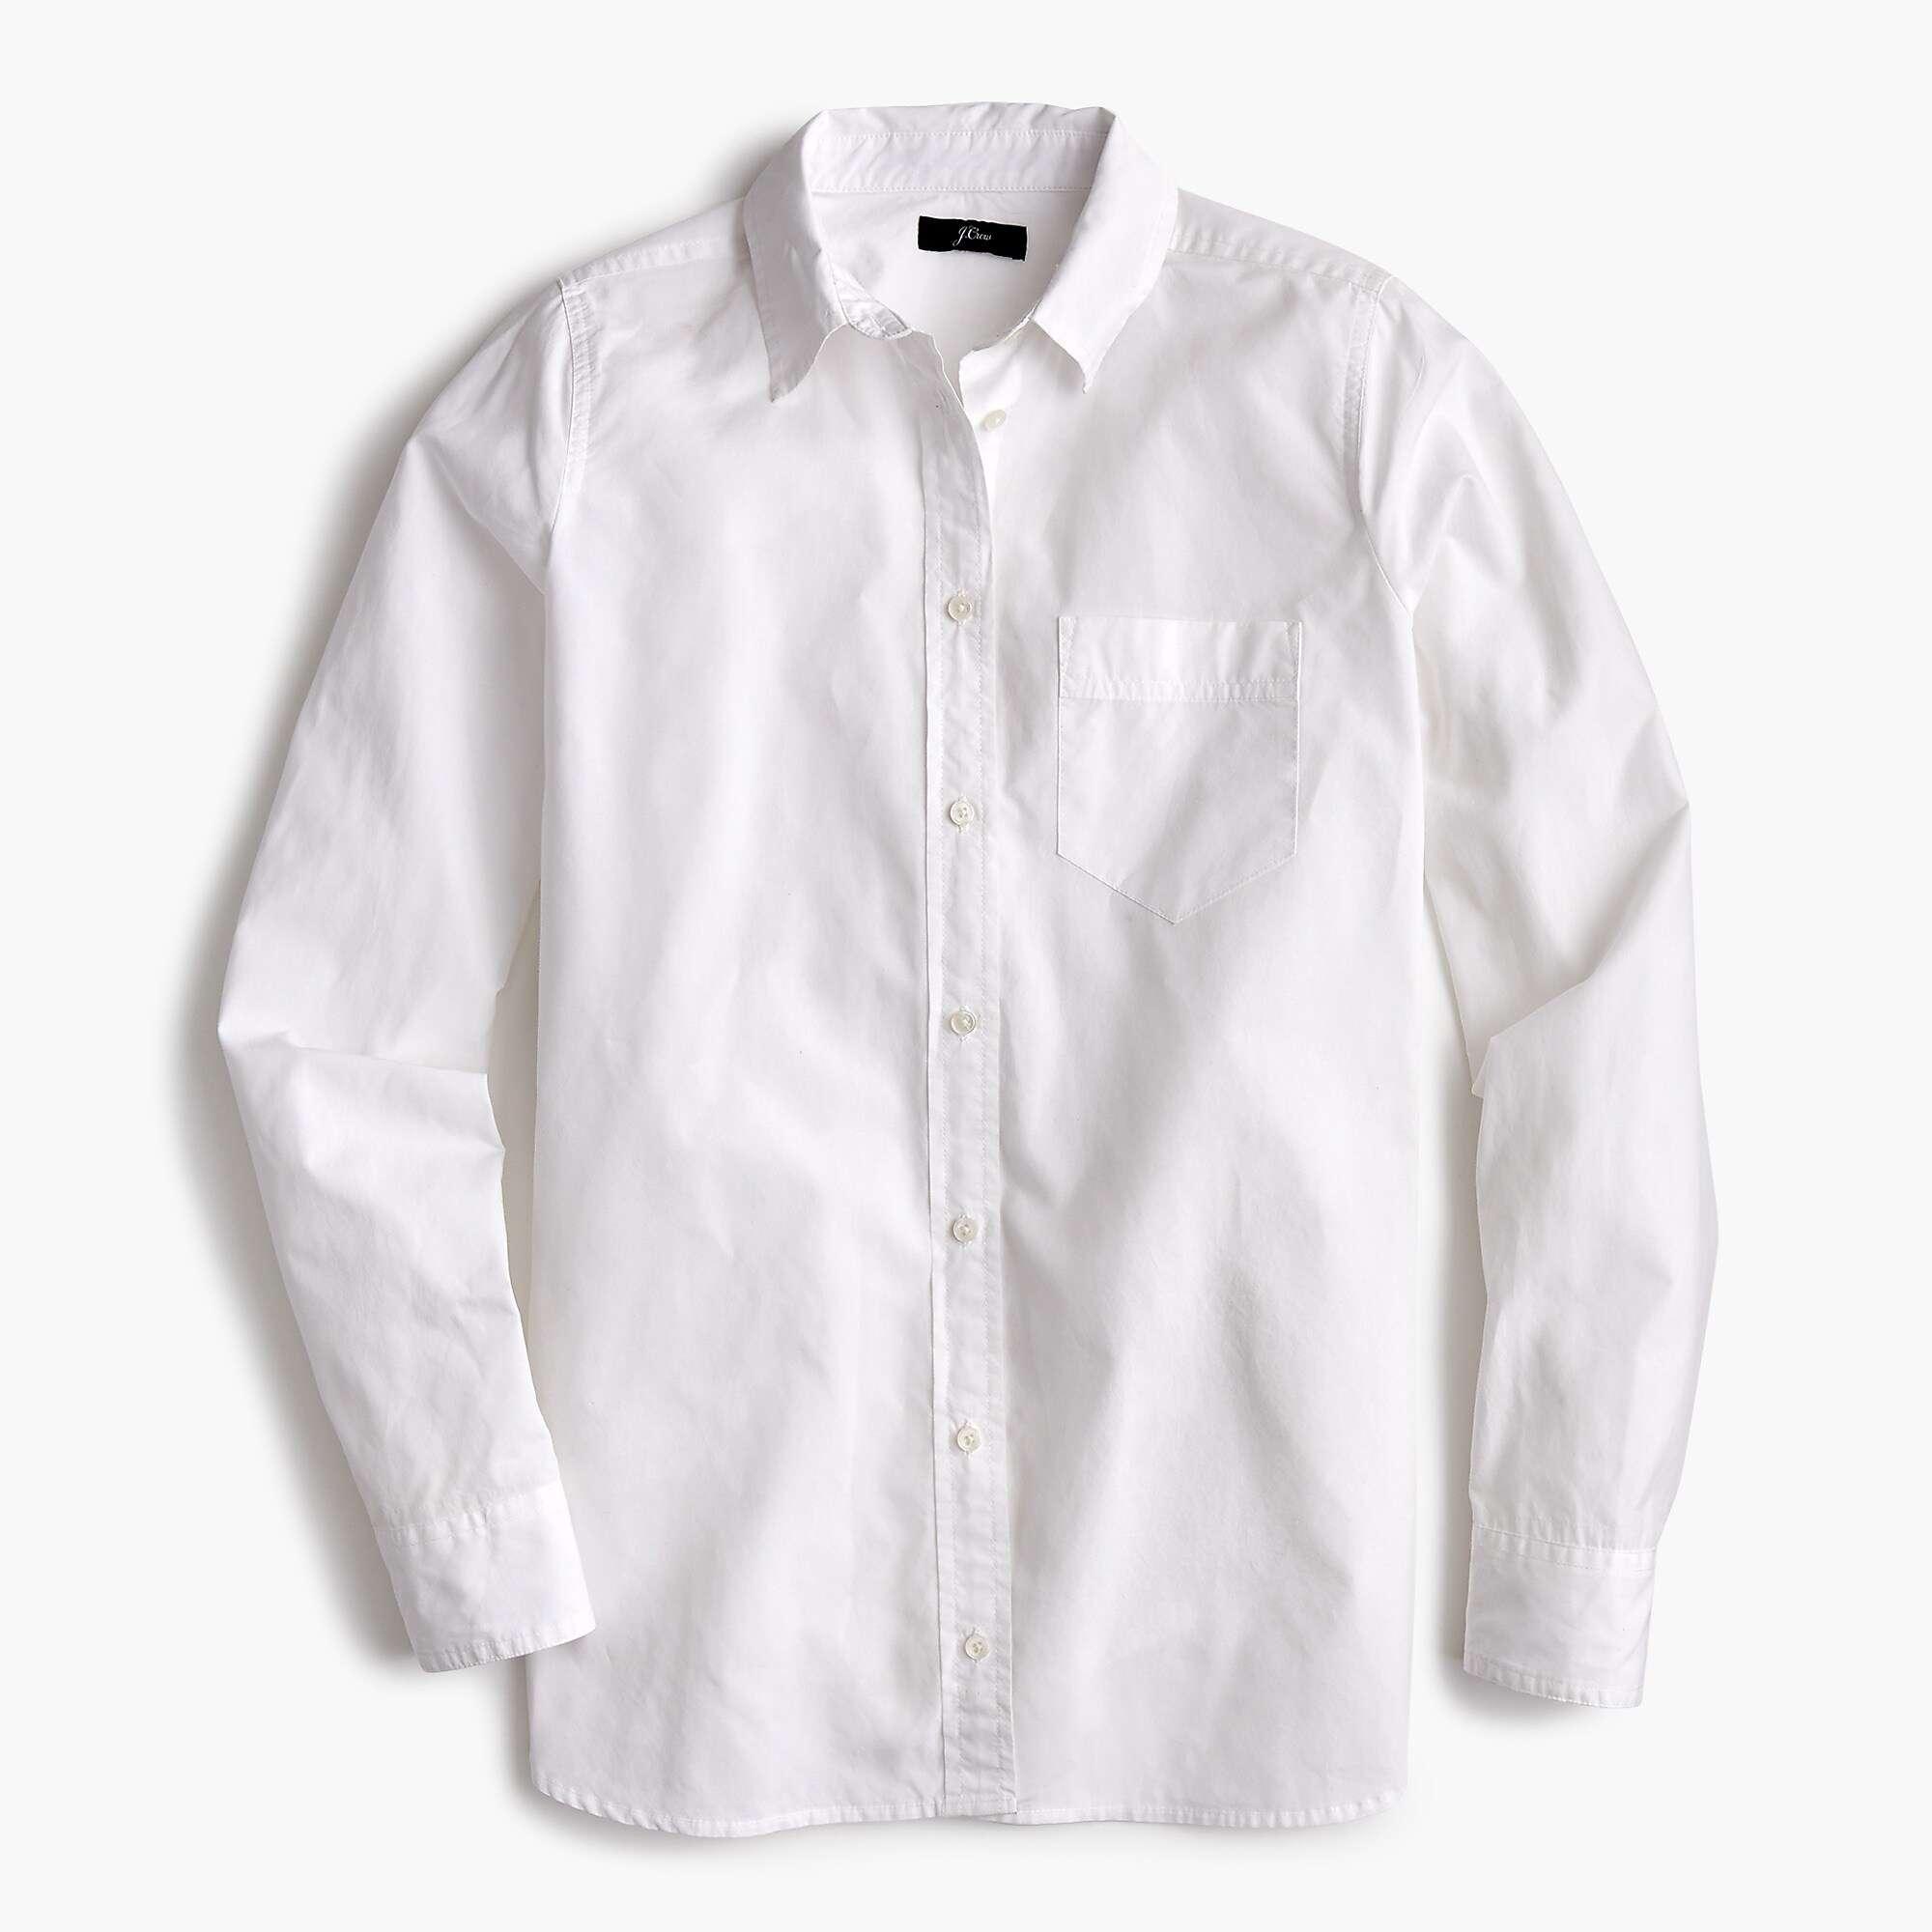 Classic-fit boy shirt in cotton poplin